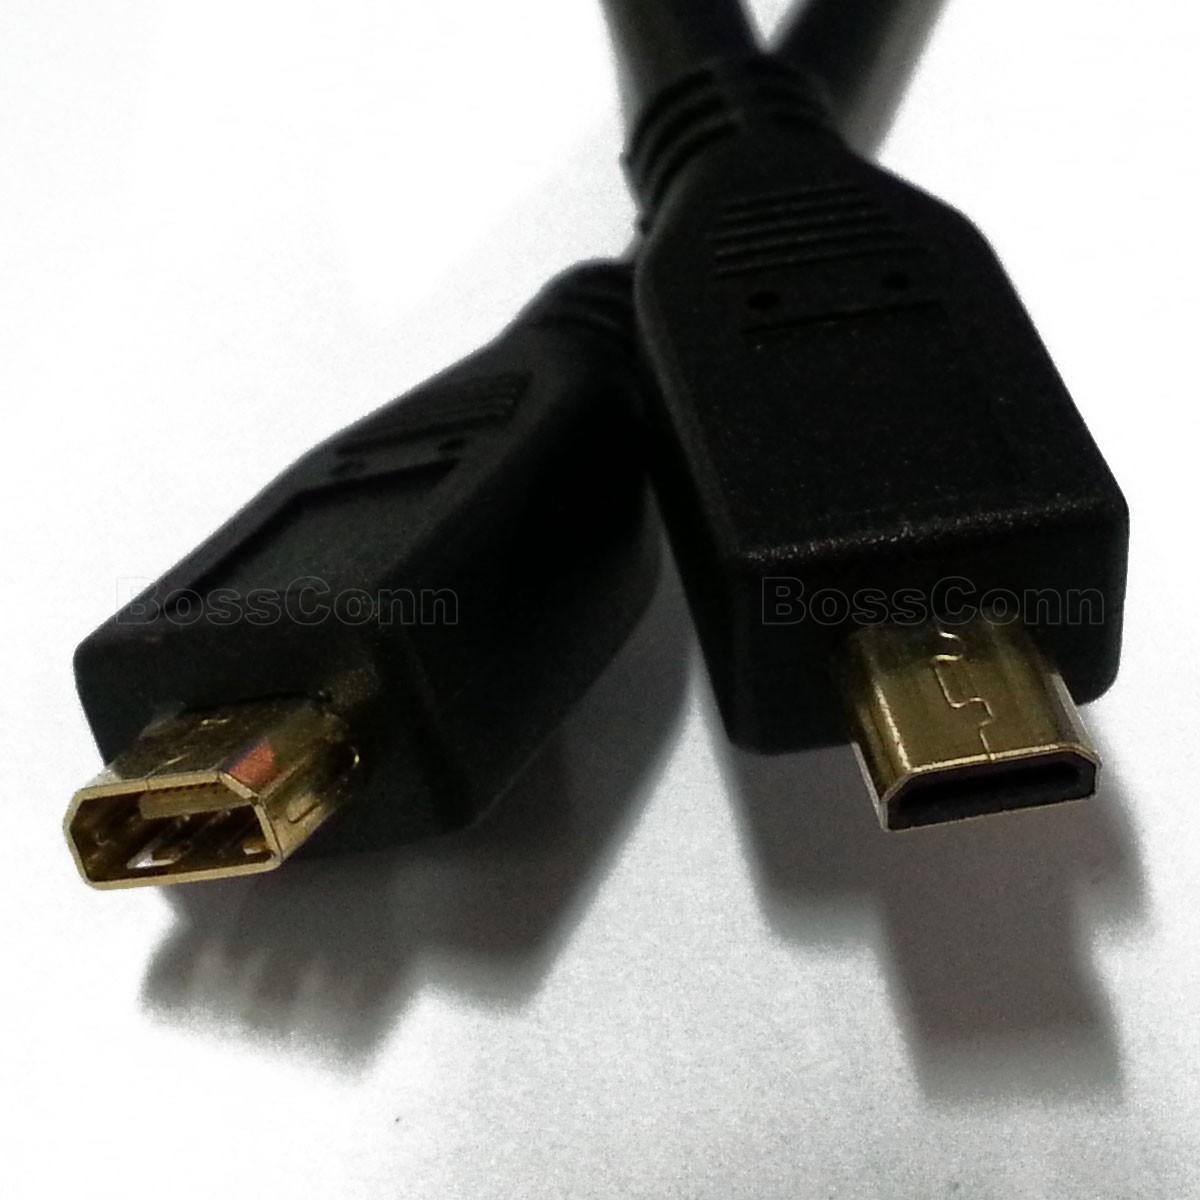 Micro HDMI Male to Female Cable